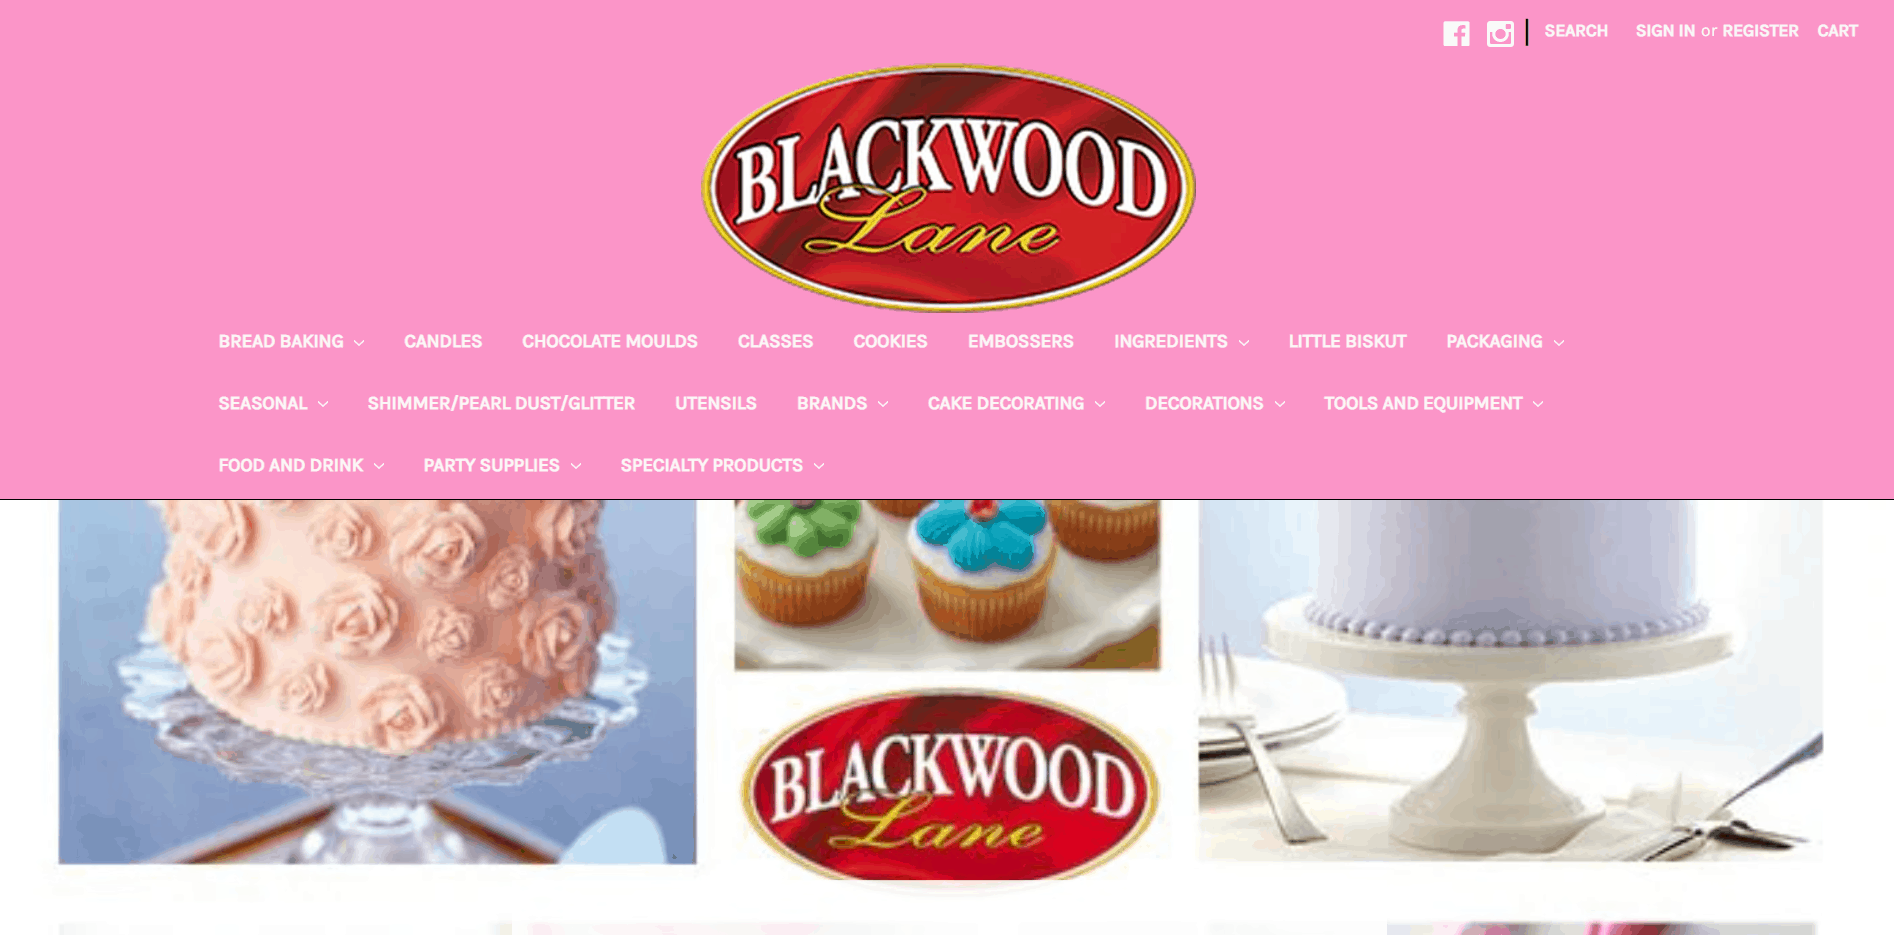 Blackwood Lane